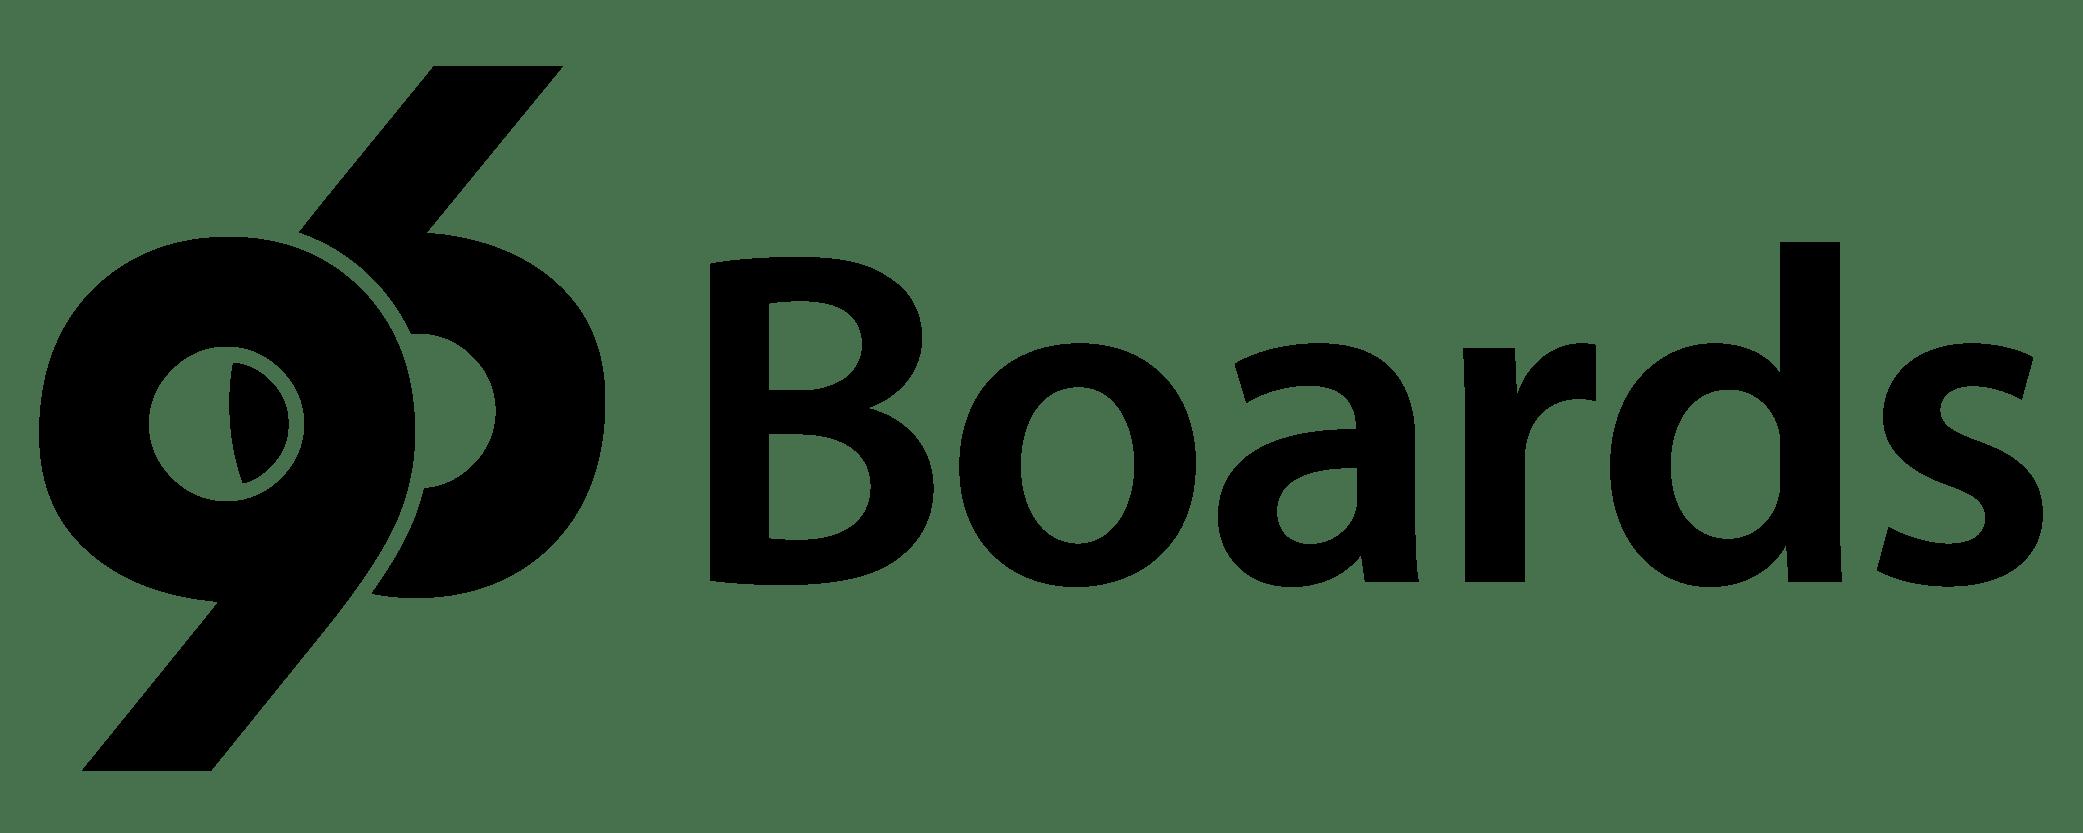 96Boards-Logo-Standard.png